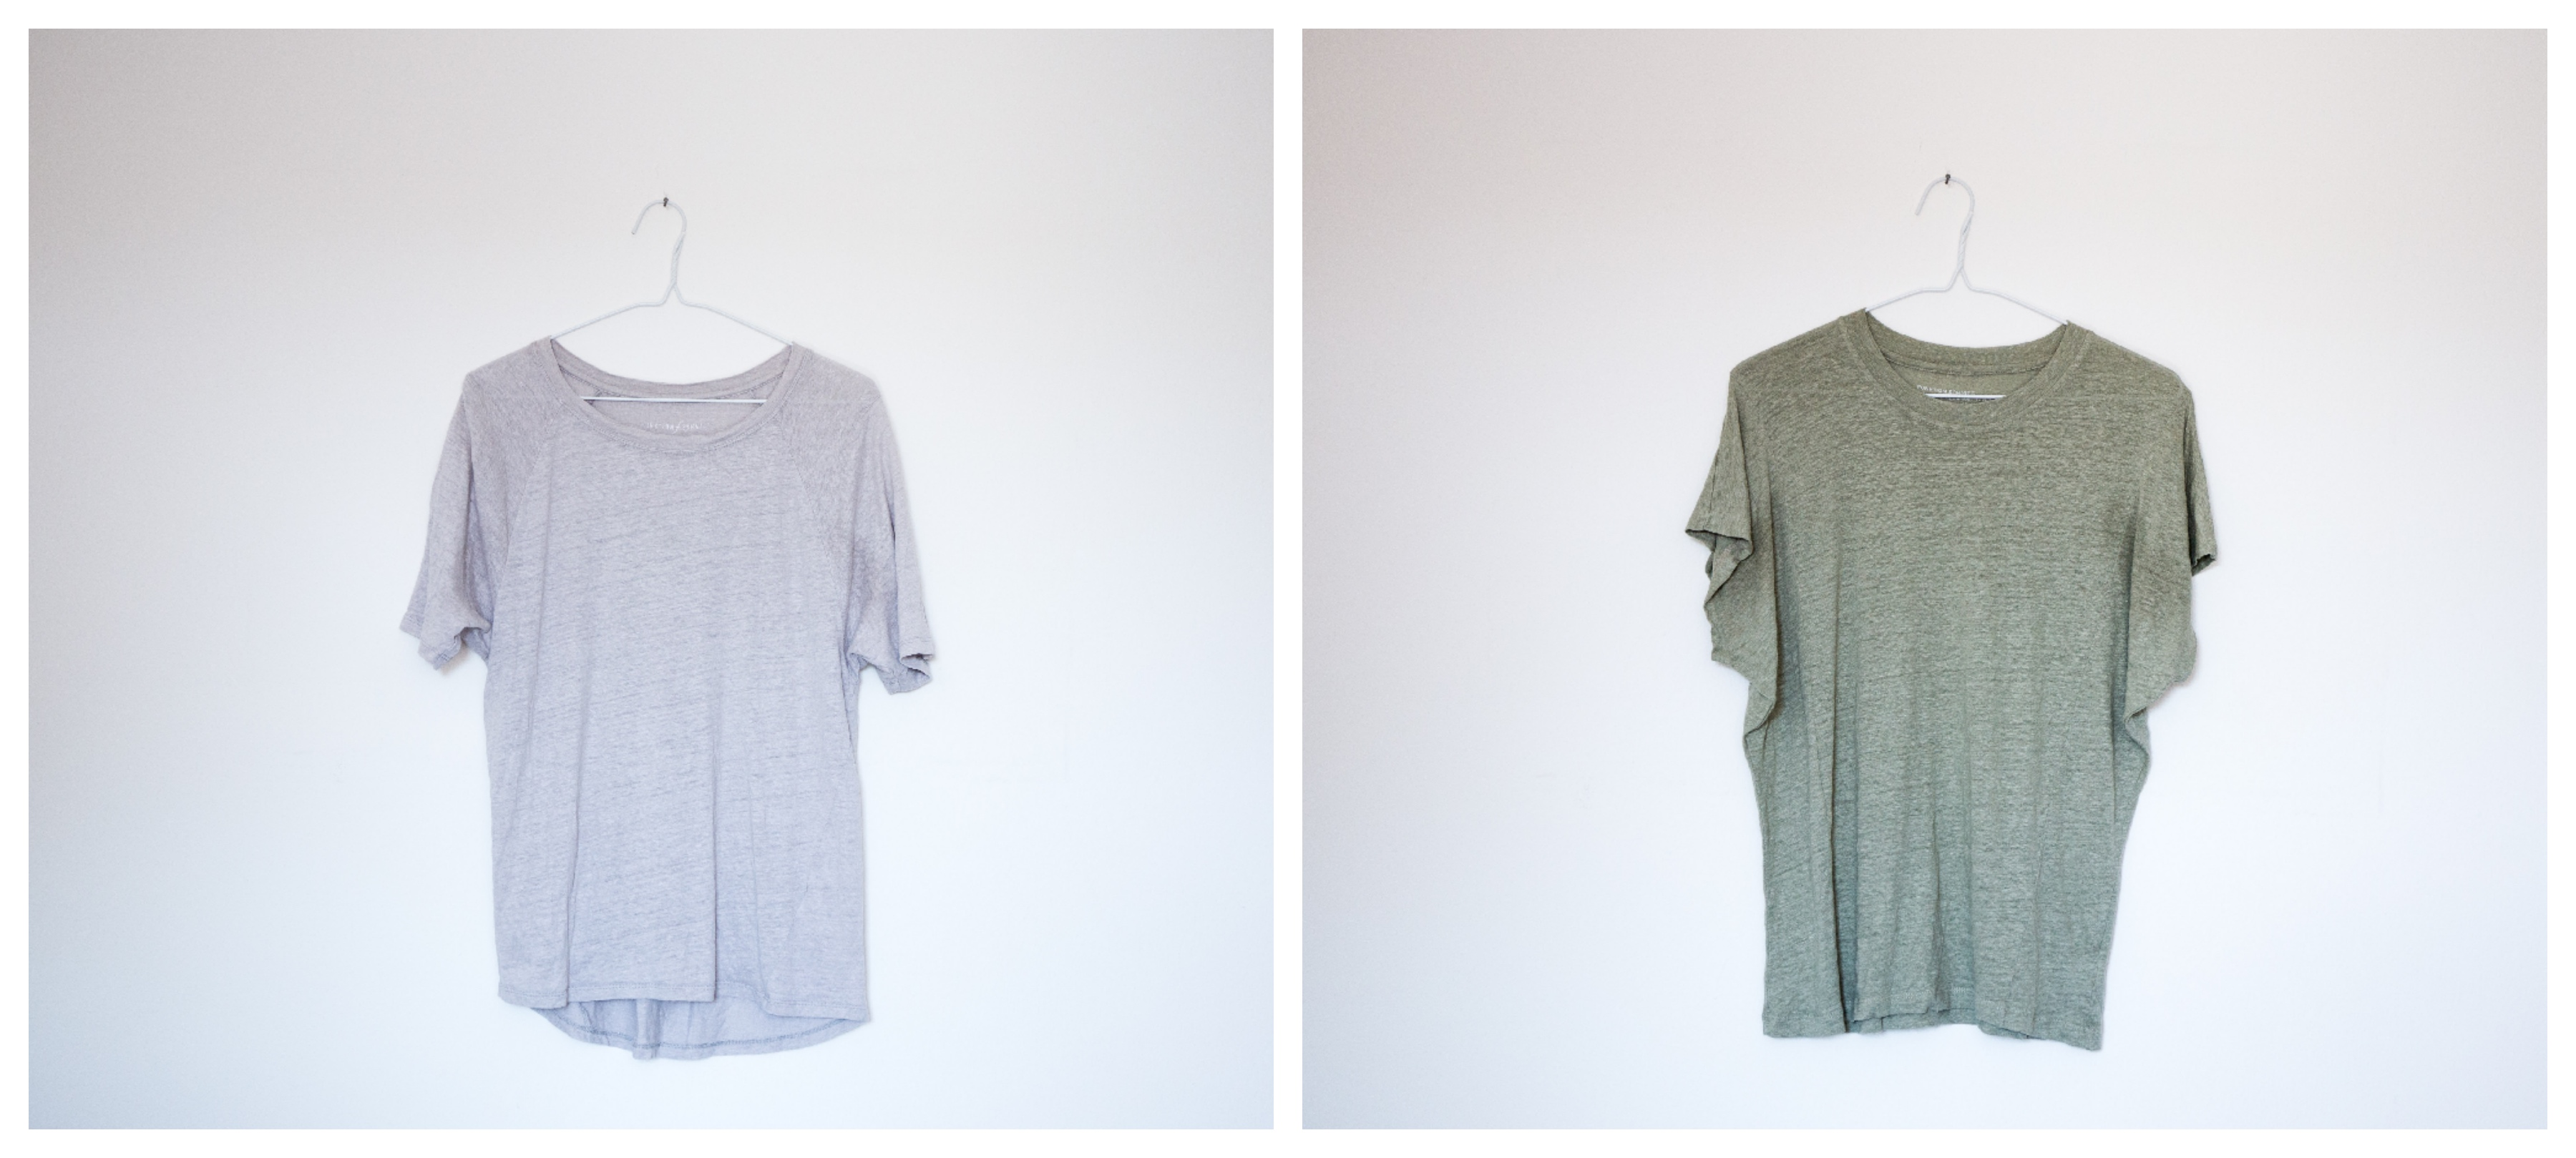 Minimalismus: Capsule Wardrobe